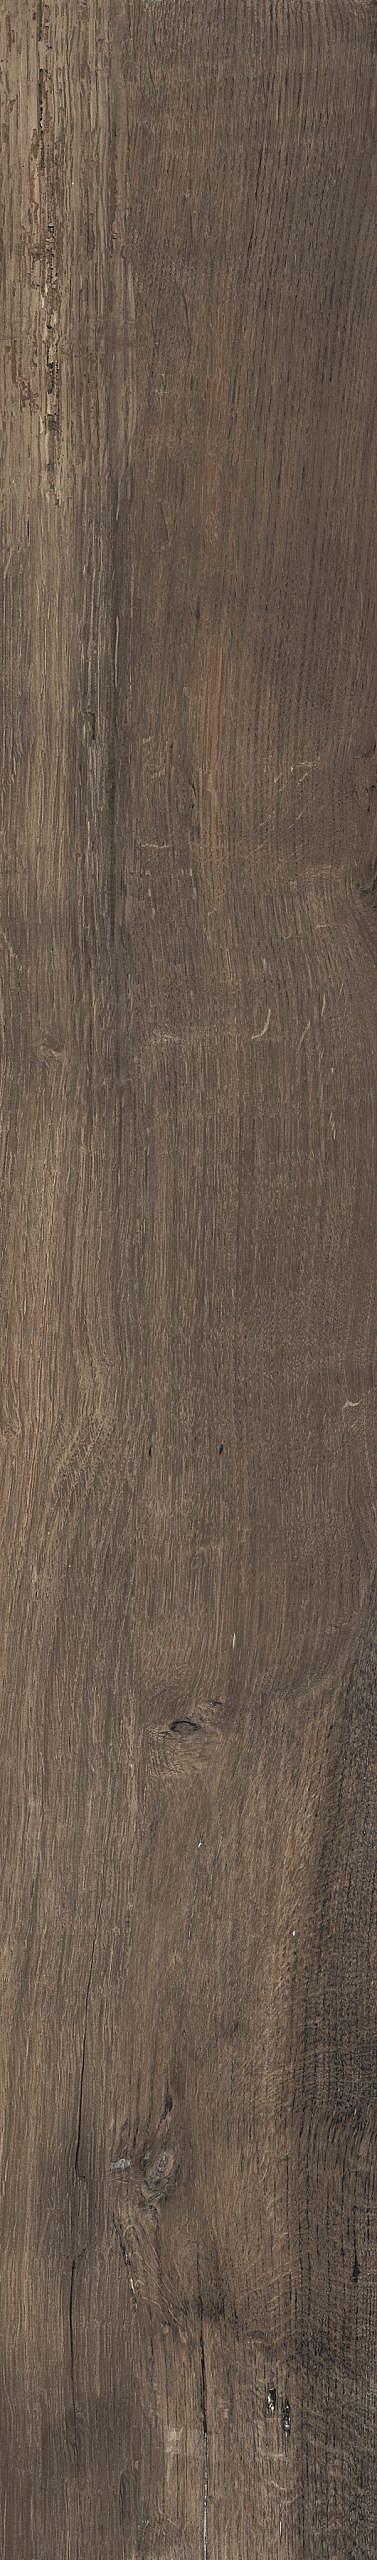 Potenza-bruin-26,5x180